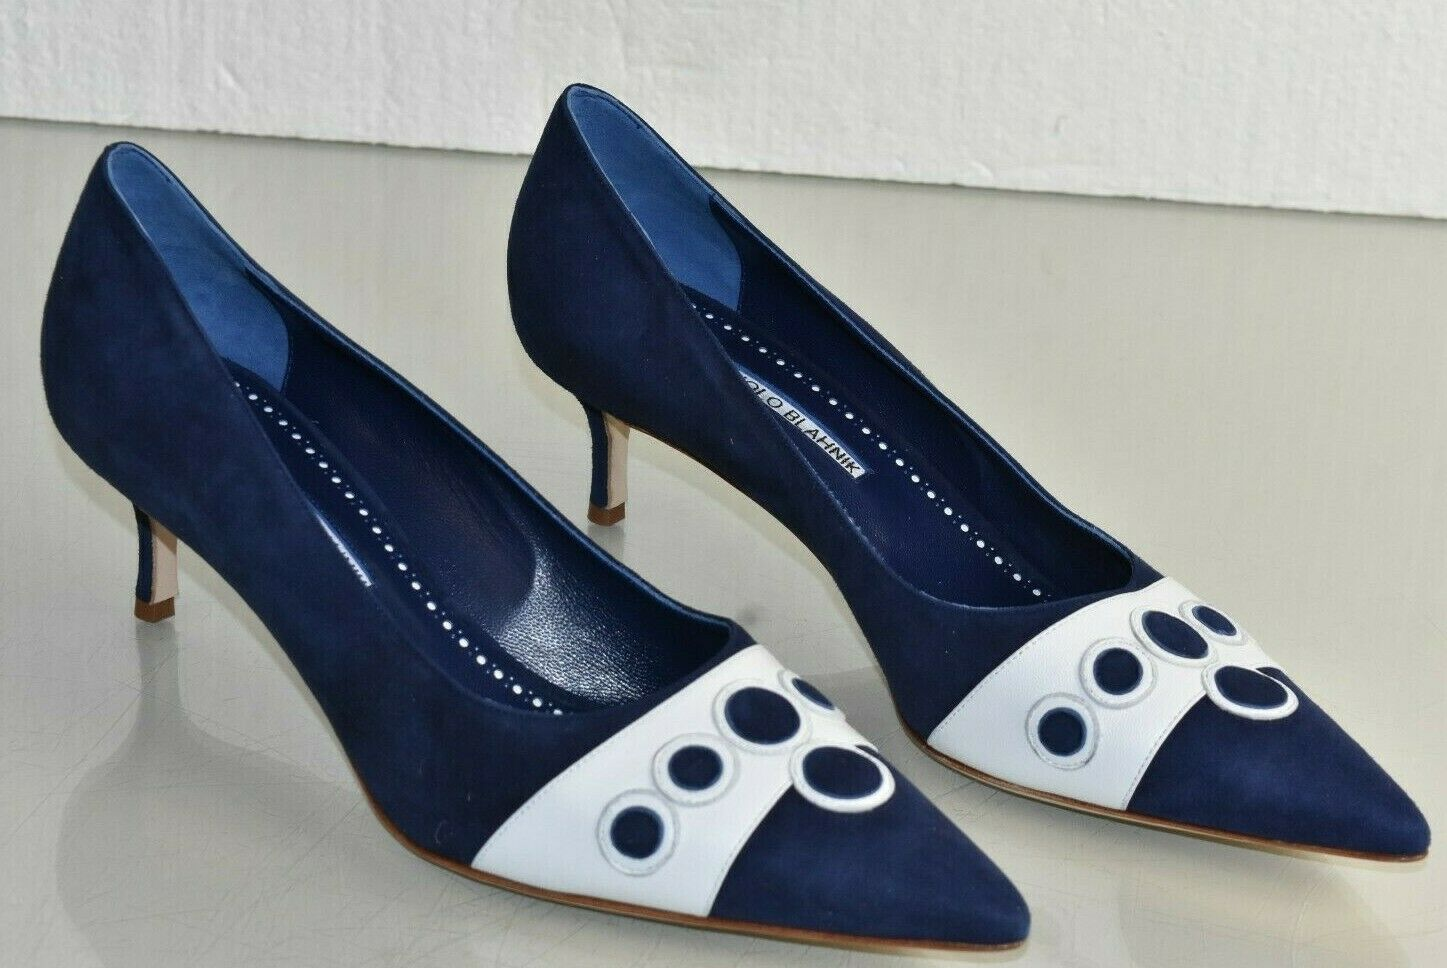 NEW Manolo Blahnik Pumps BB Suede Navy bluee White Kitten Heel Leather shoes 41.5